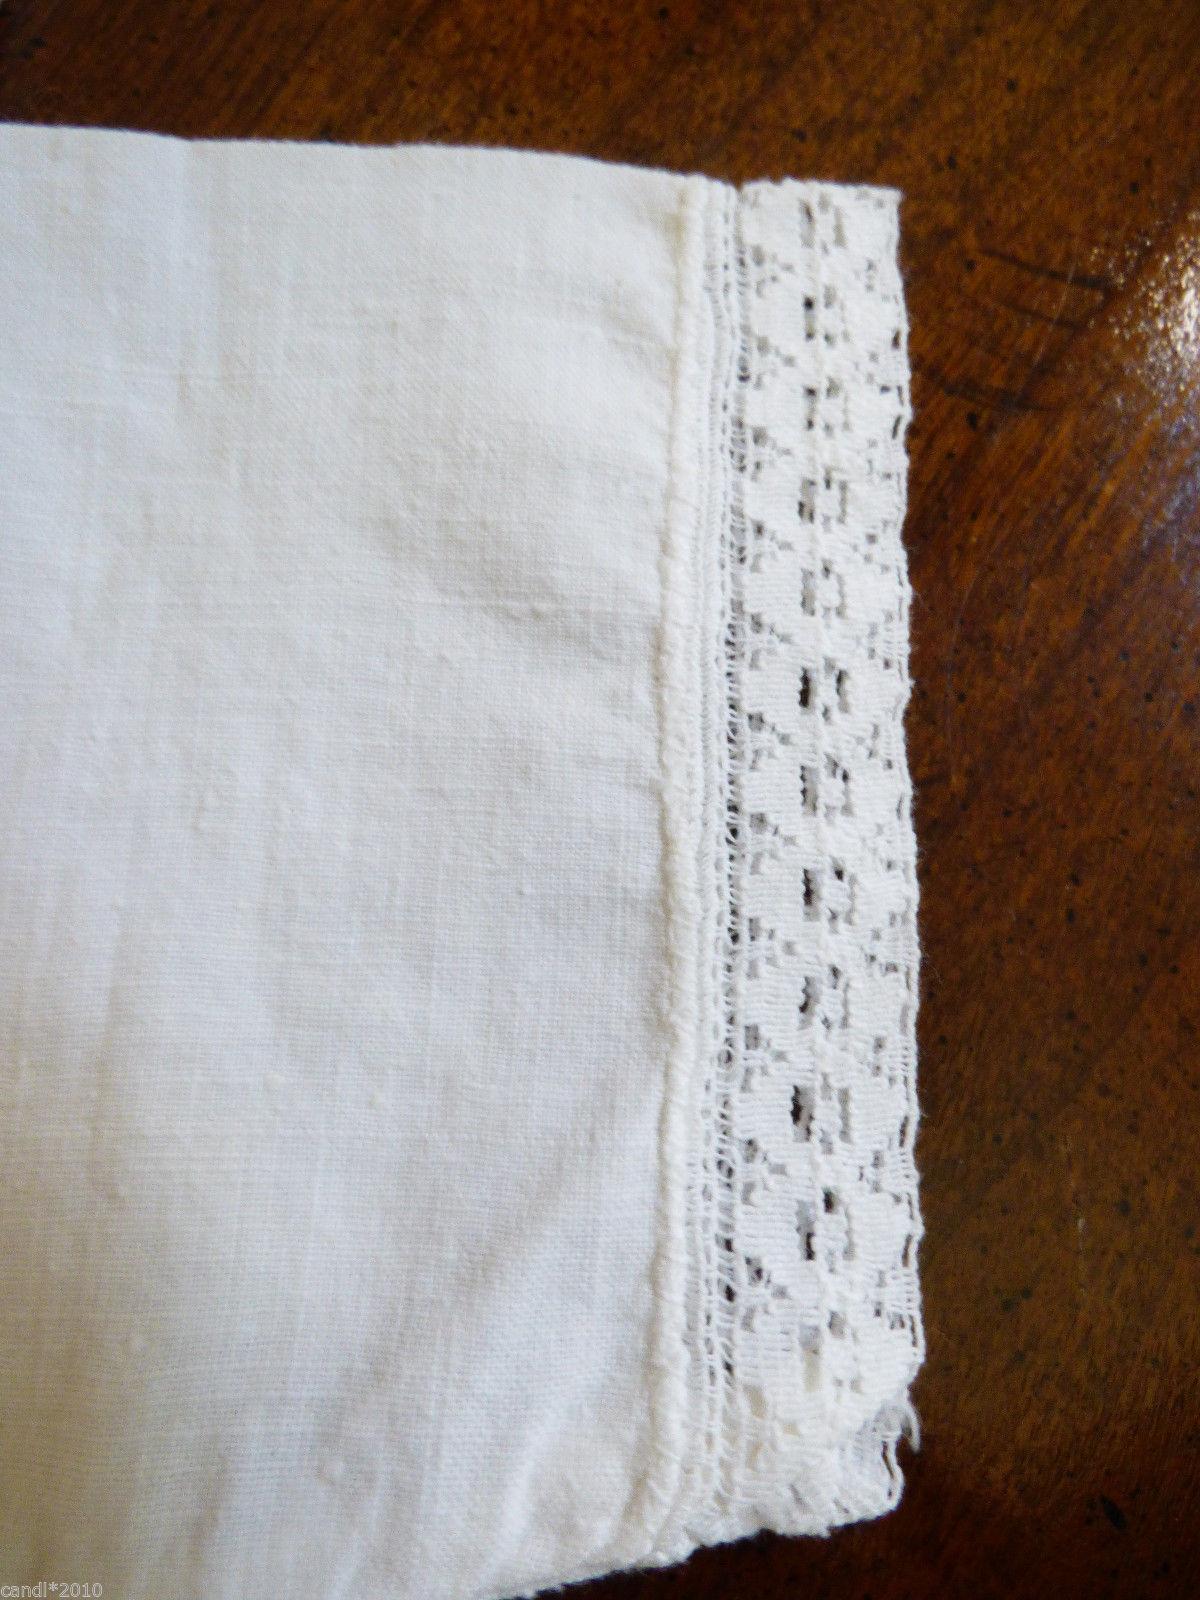 VTG 1960's Russian Newborn baby cotton lace under shirt lot of 2 Rasposhonka